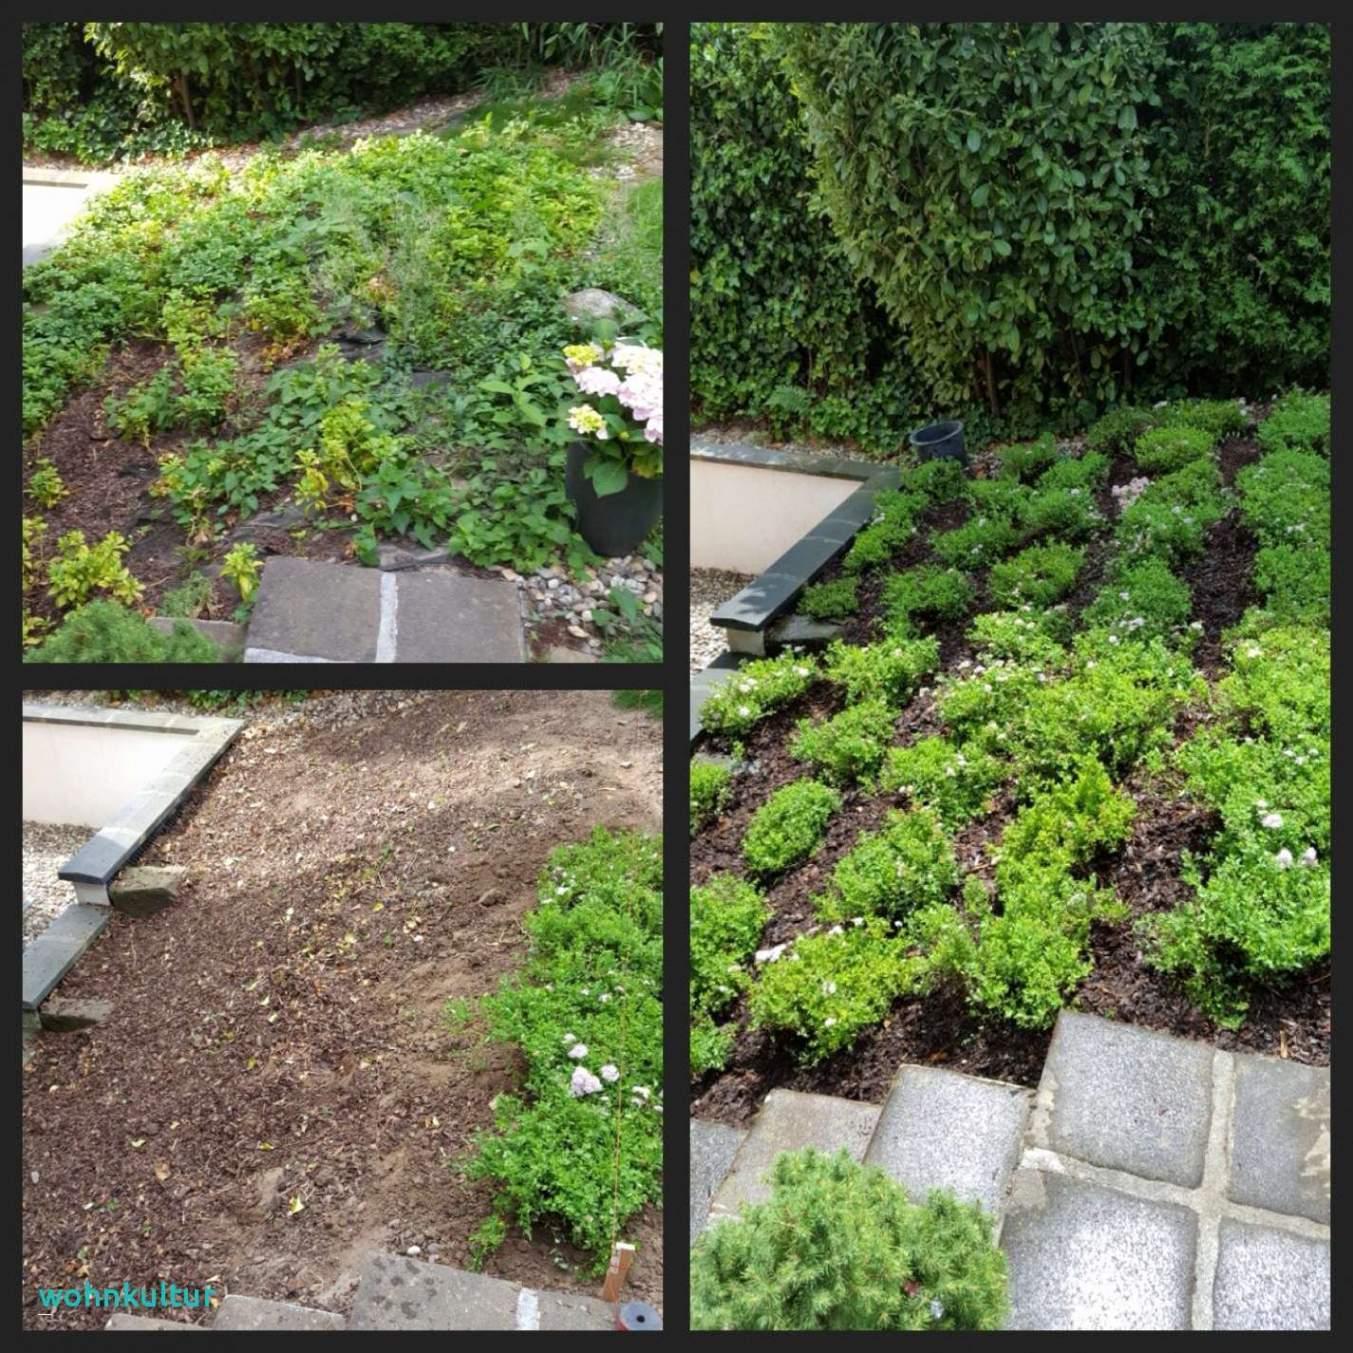 Botanische Garten Berlin Reizend Terrasse Am Hang Temobardz Home Blog Garten Anlegen